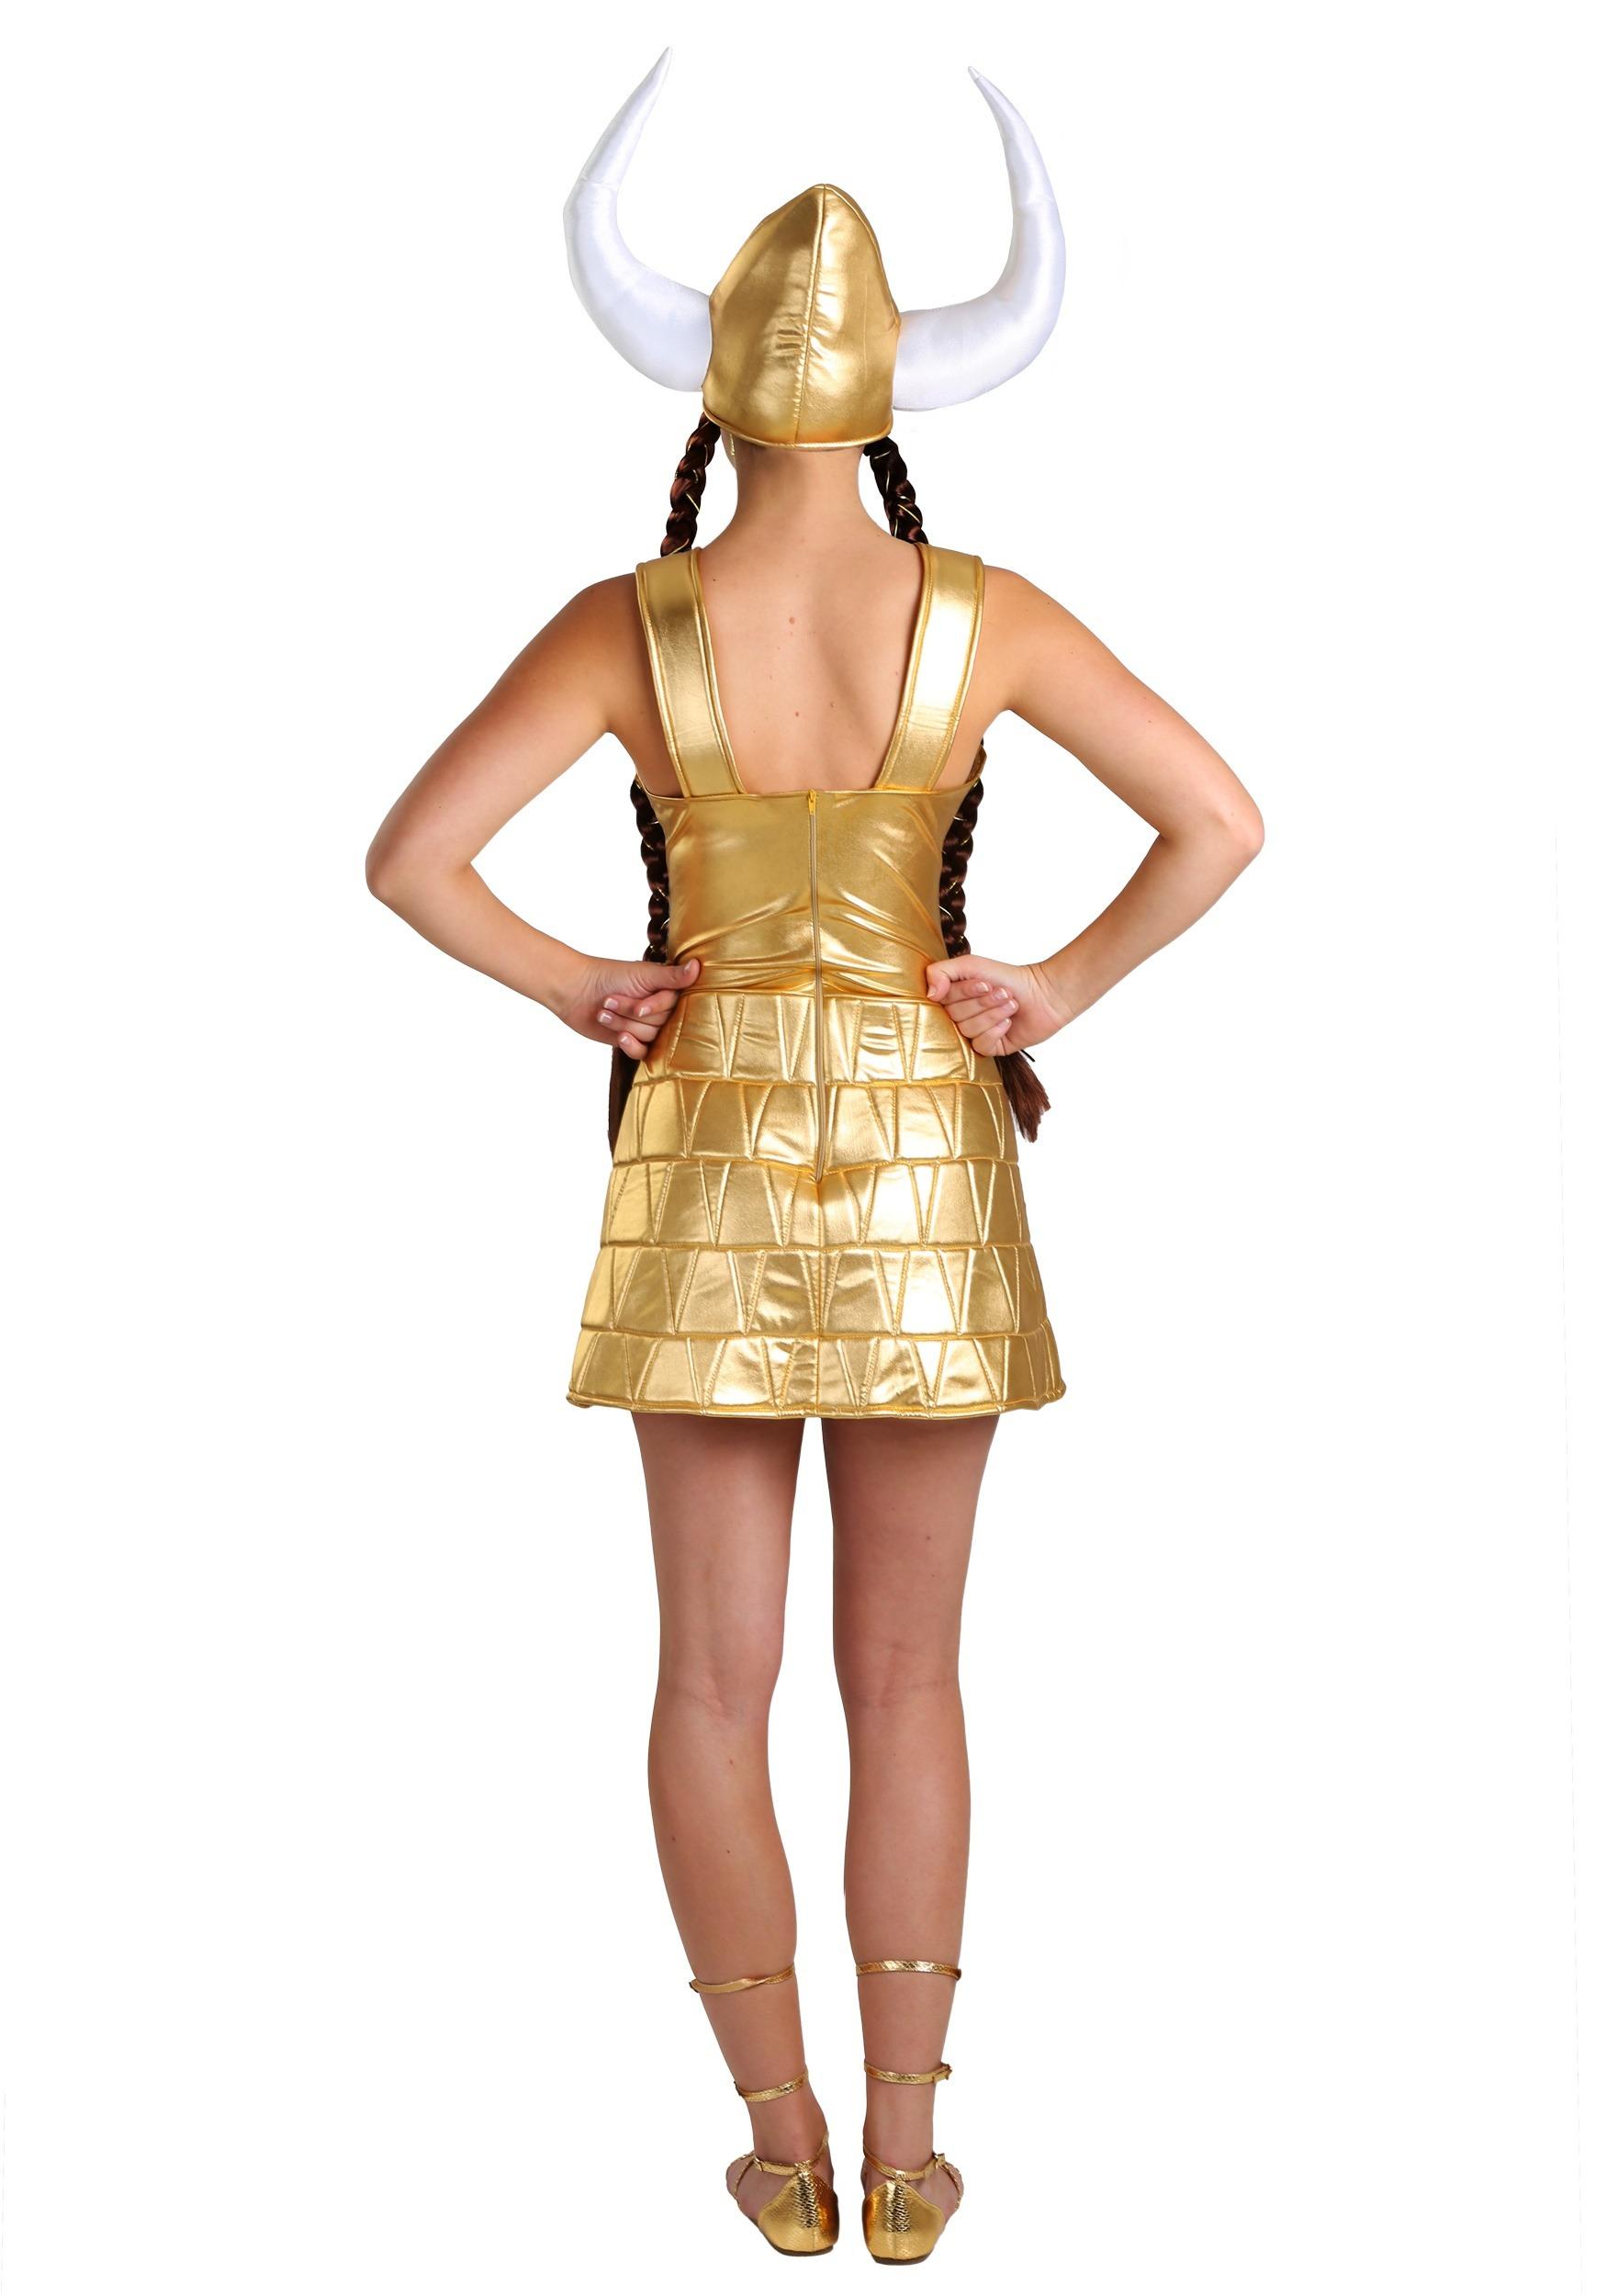 Maude Lebowski Halloween Costume